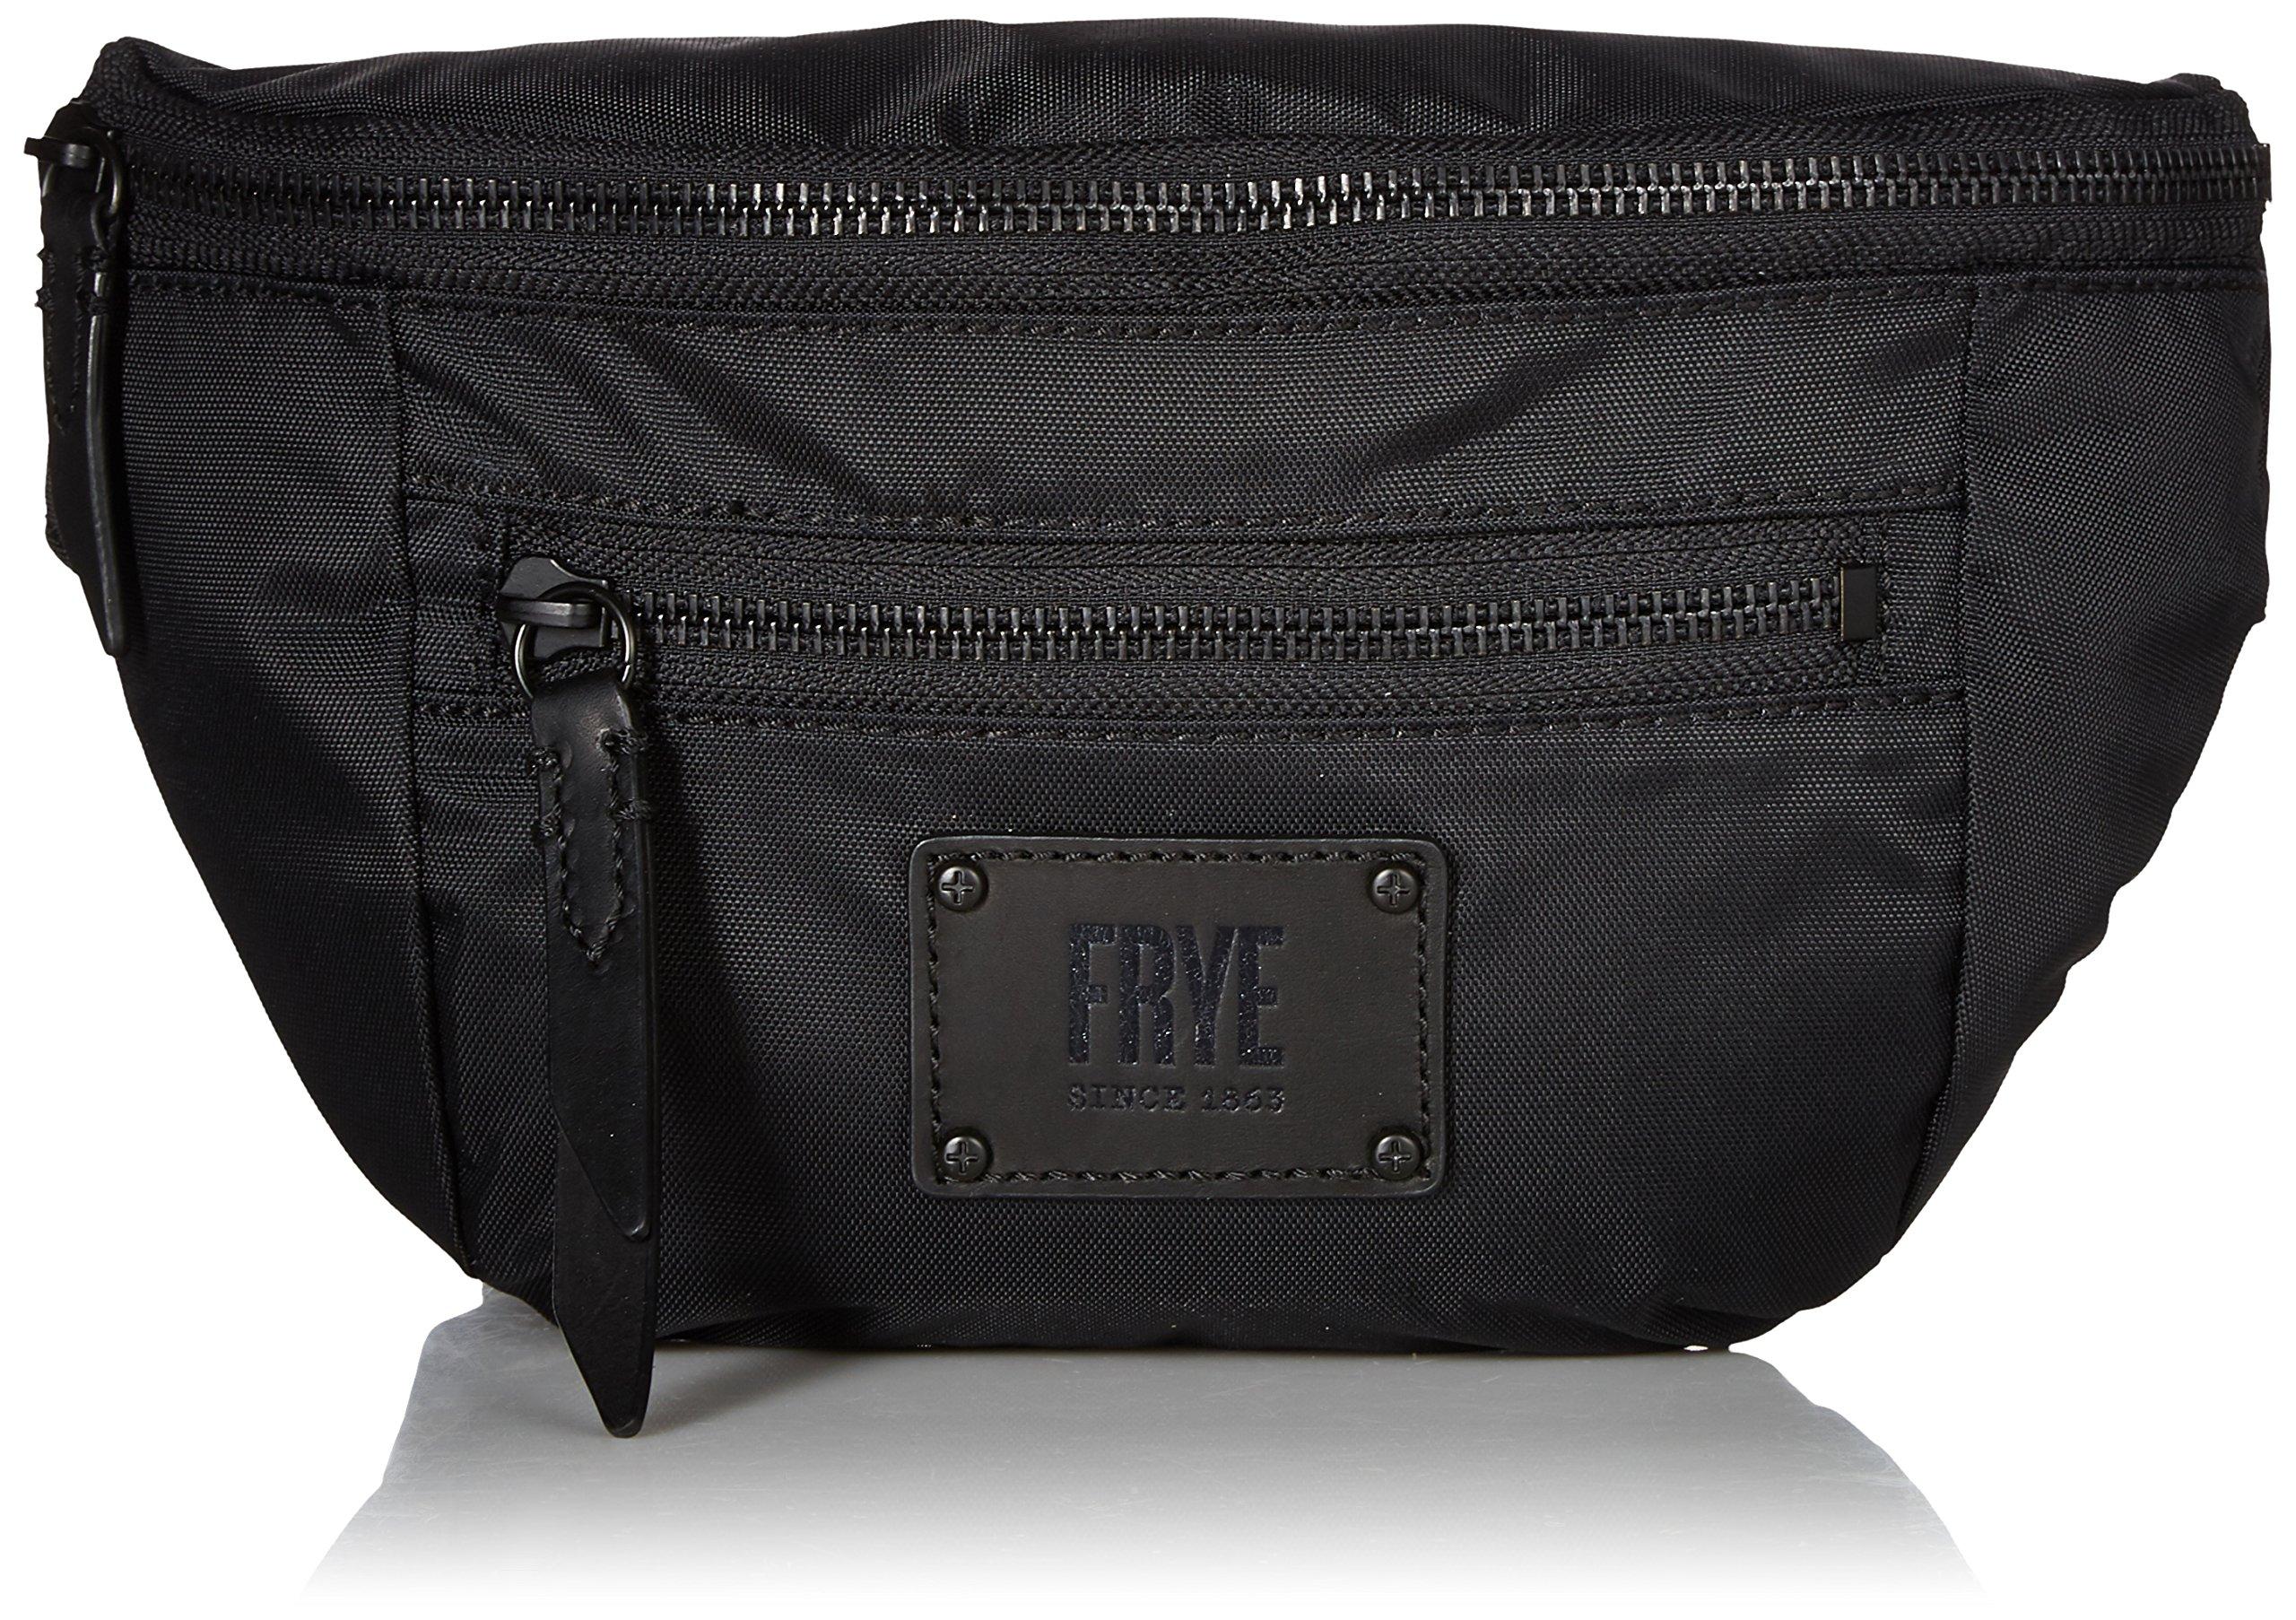 FRYE Ivy Nylon Convertible Crossbody Belt Bag, matte black